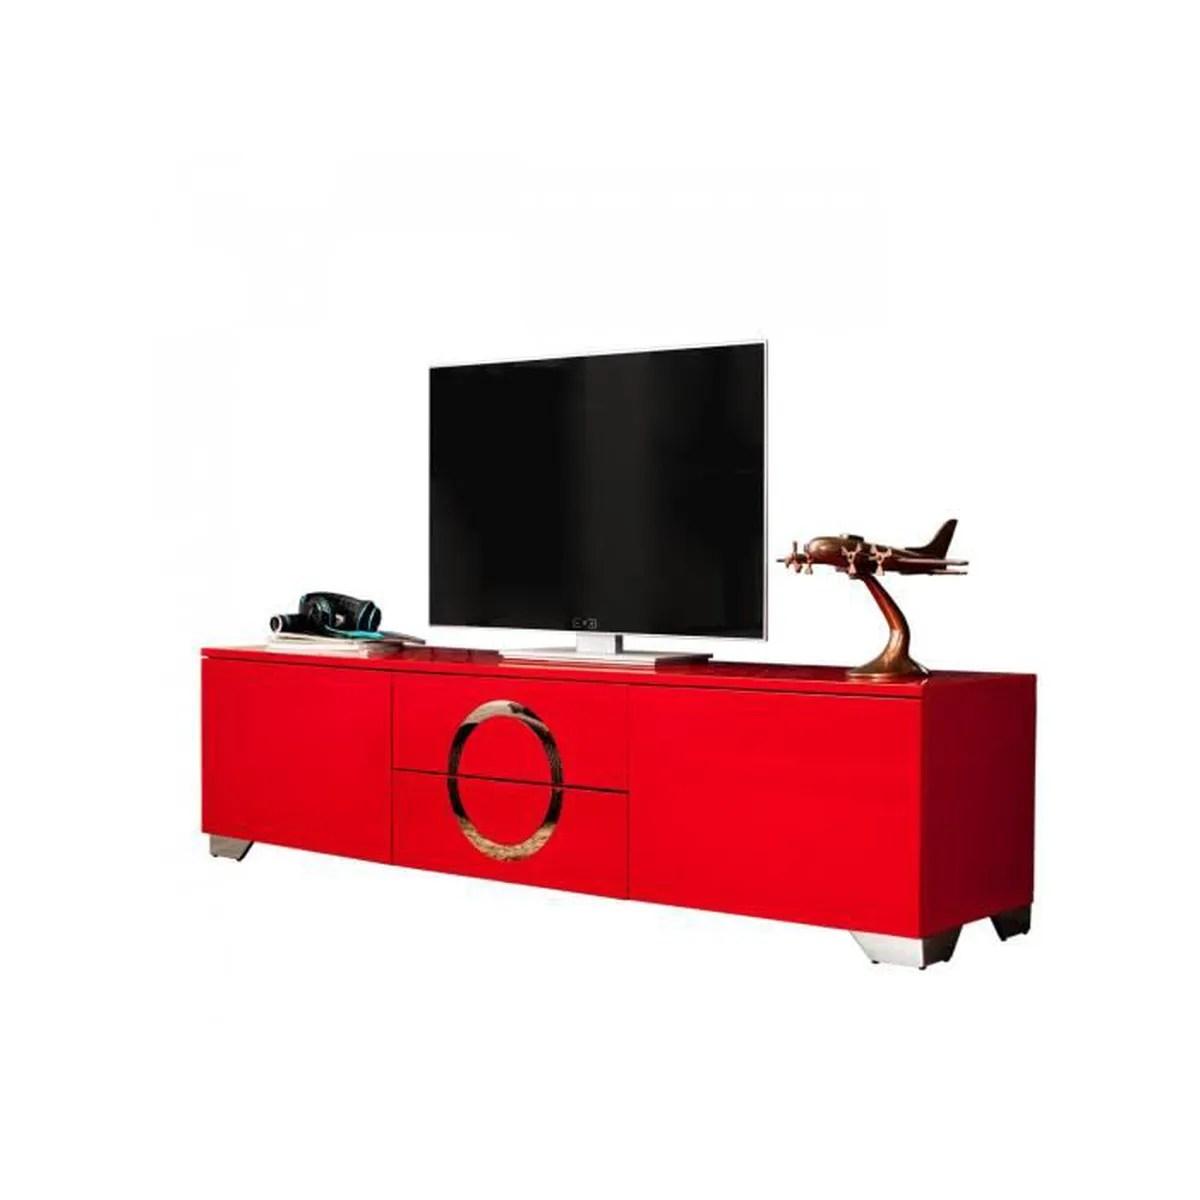 Meuble Tv Design Rouge Cheminee Bioethanol 616852 Meuble Tv Rouge